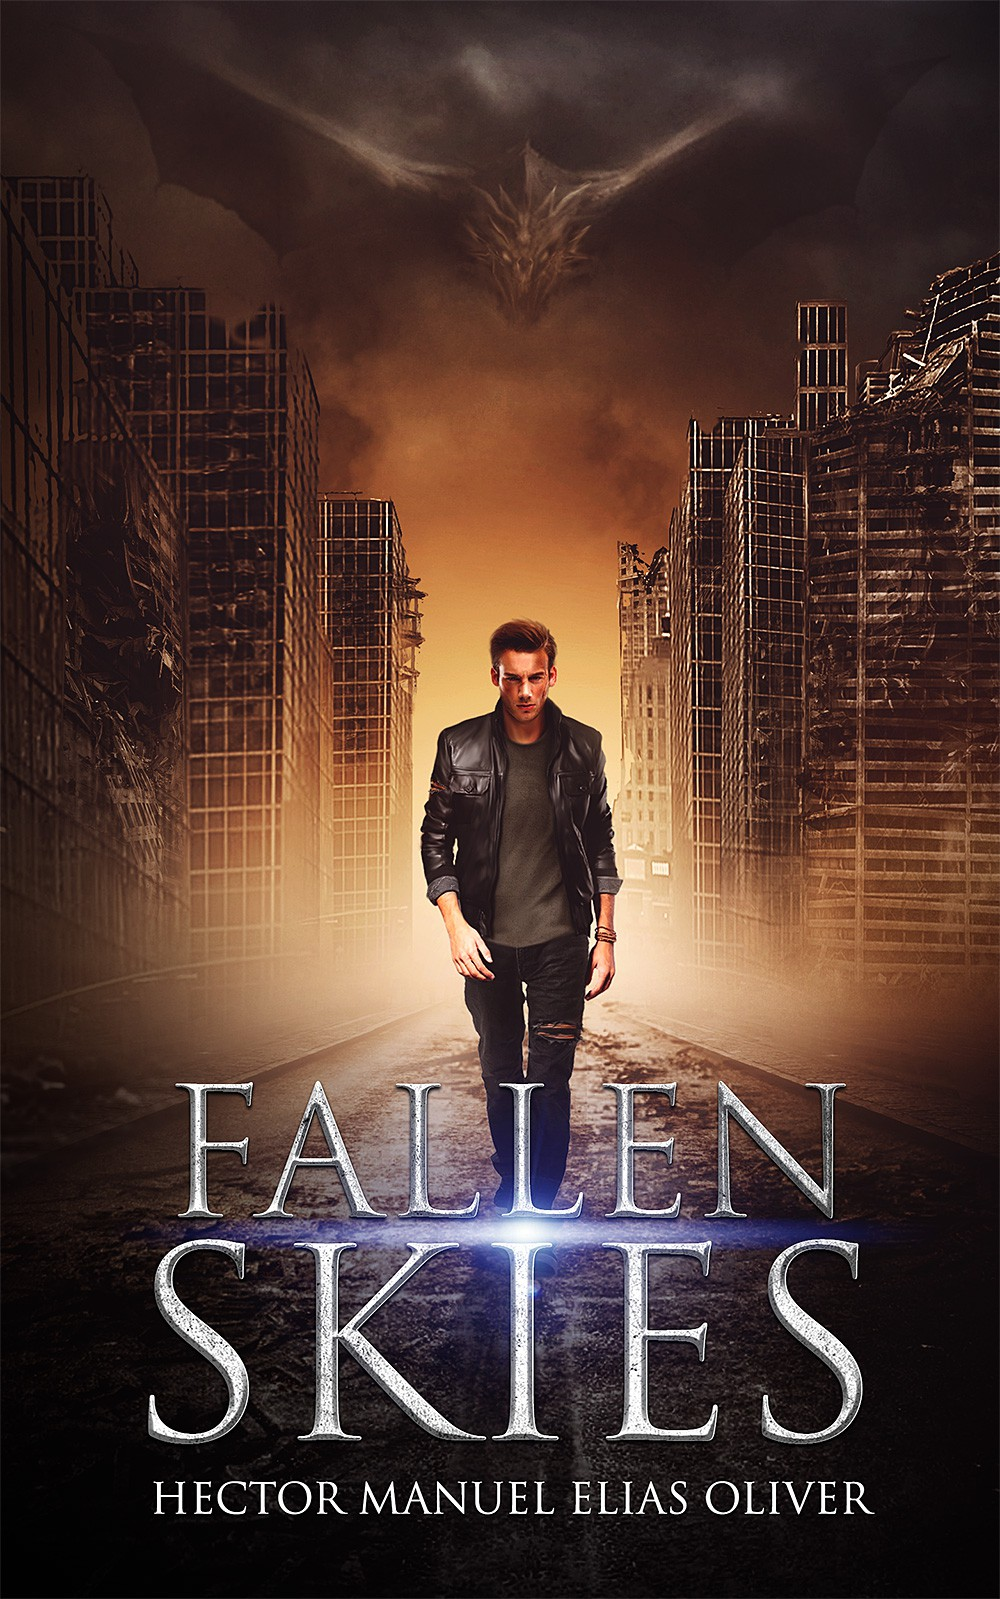 Create a cover for a new Epic Dystopian Fantasy/Sci-Fi Adventure book!